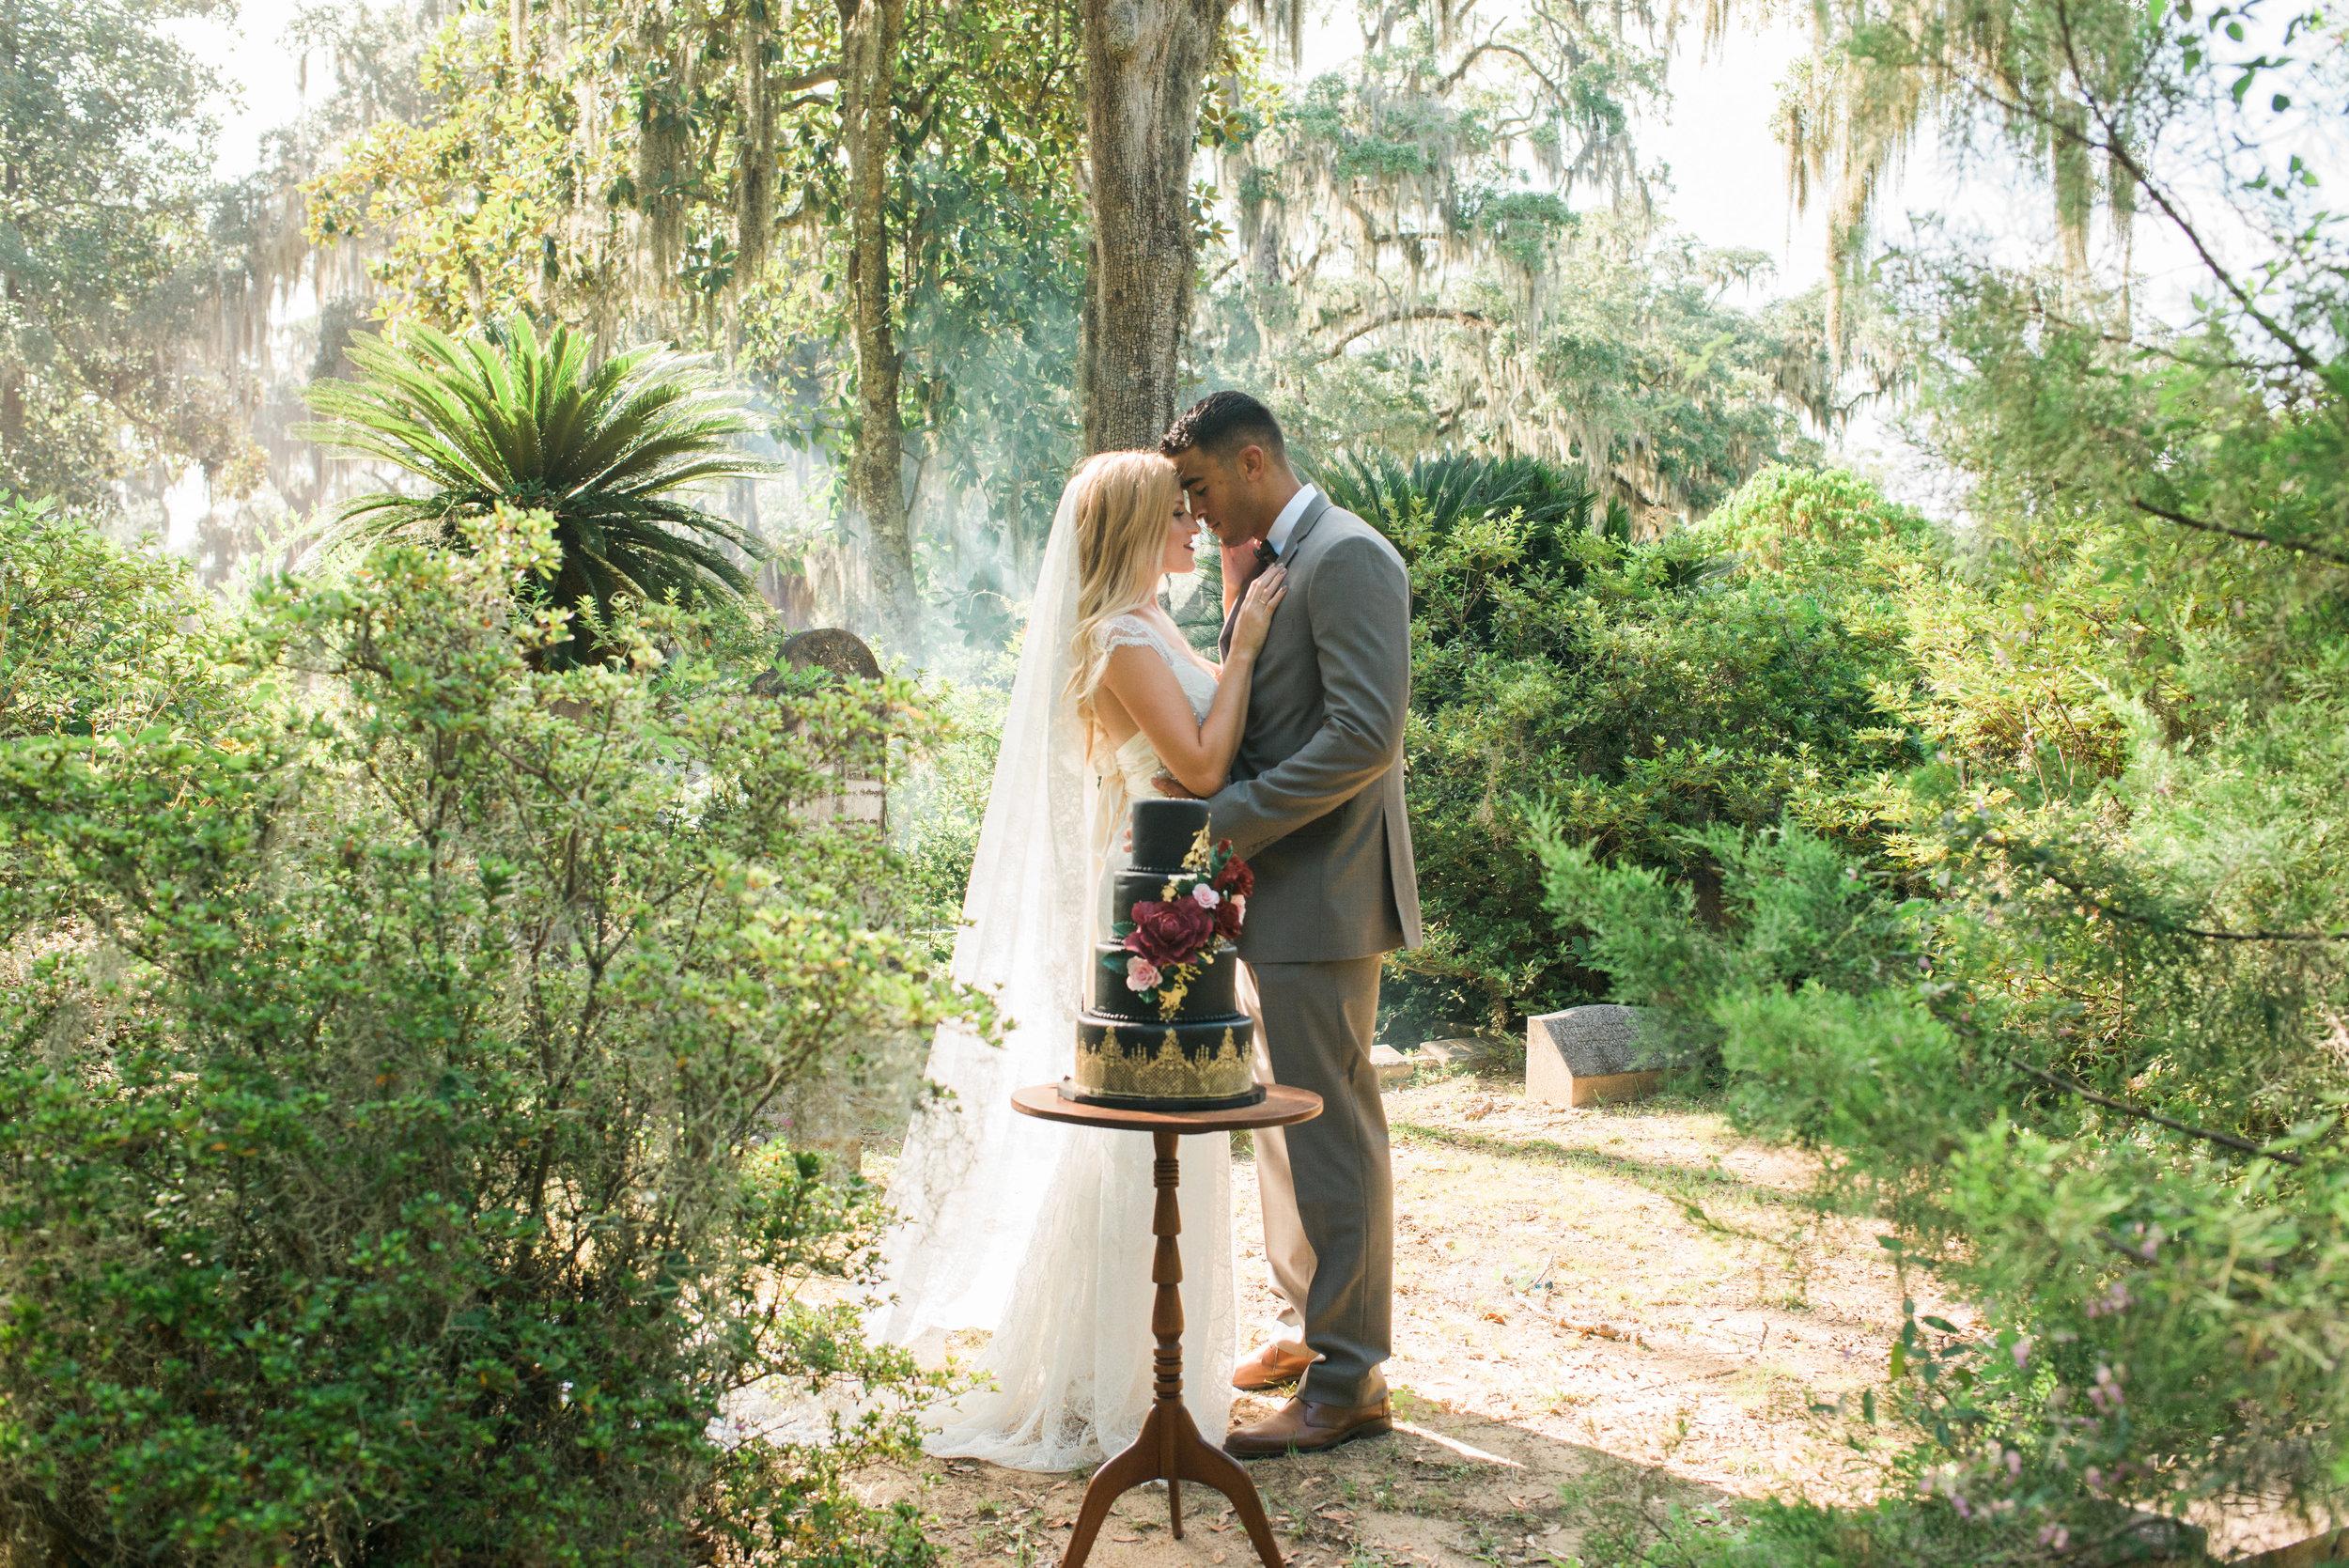 callie-beale-photography-Bonaventure-cemetery-michelle-royal-makeup-cemetery-wedding-ivory-and-beau-wedding-planning-anna-campbell-harper-savannah-bridal-boutique-savannah-wedding-dresses-savannah-weddings-16.jpg